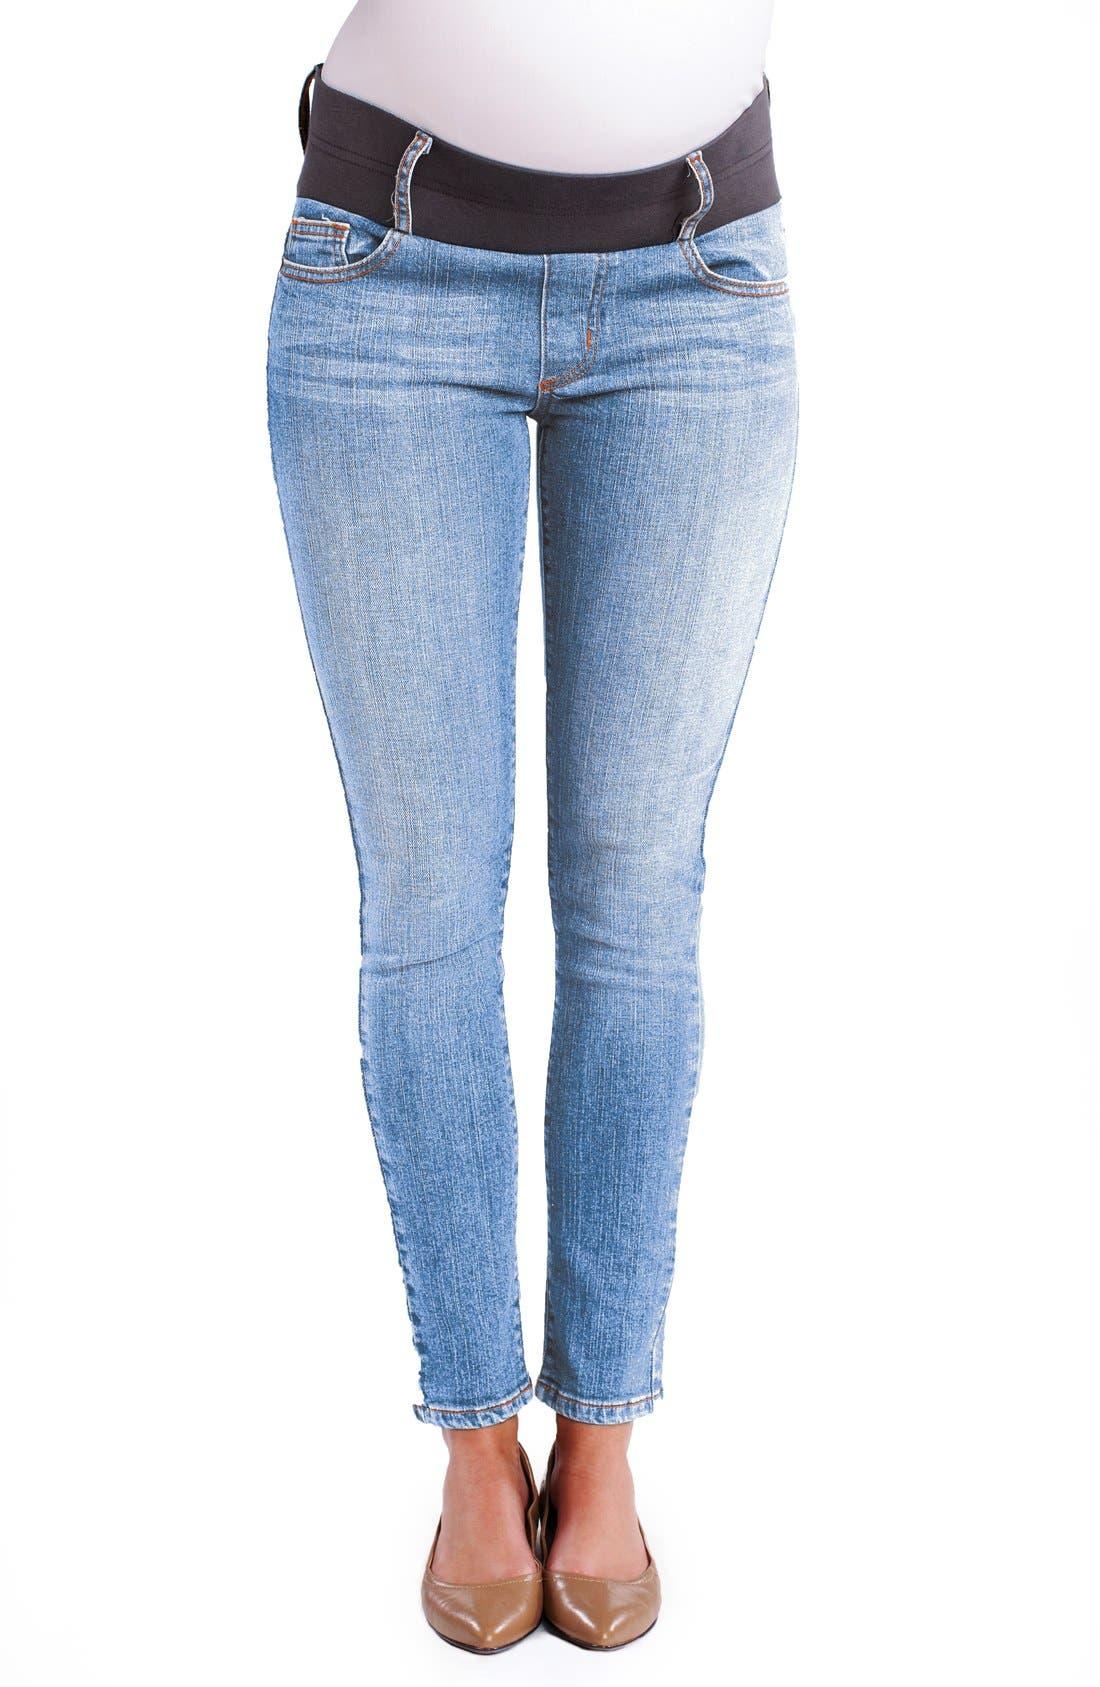 Main Image - Maternal America Maternity Ankle Skinny Jeans